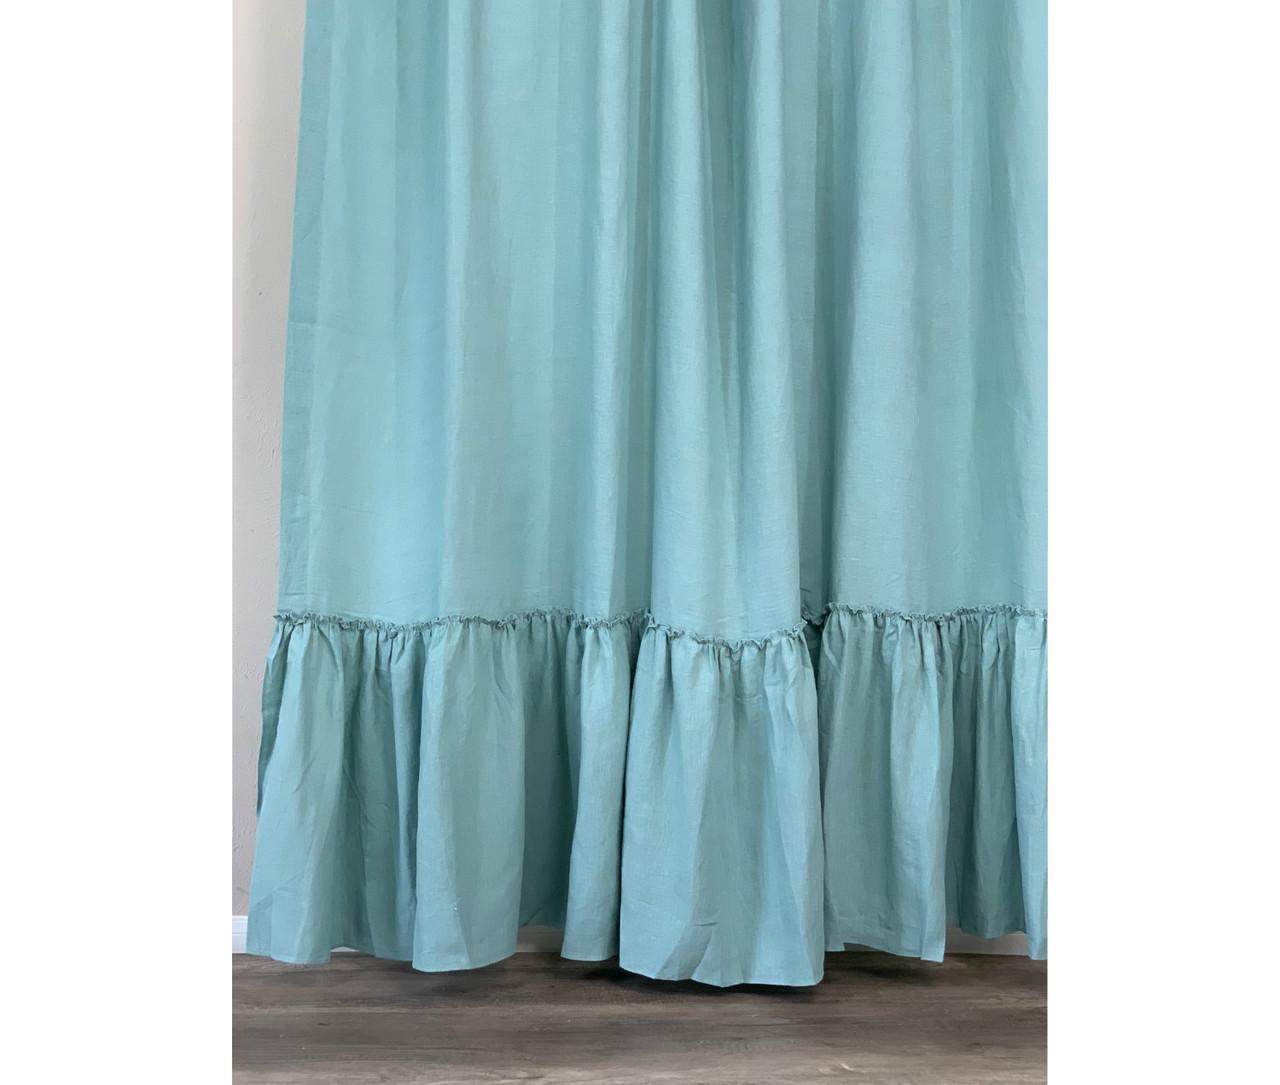 moss green linen shower curtain with country mermaid long ruffles